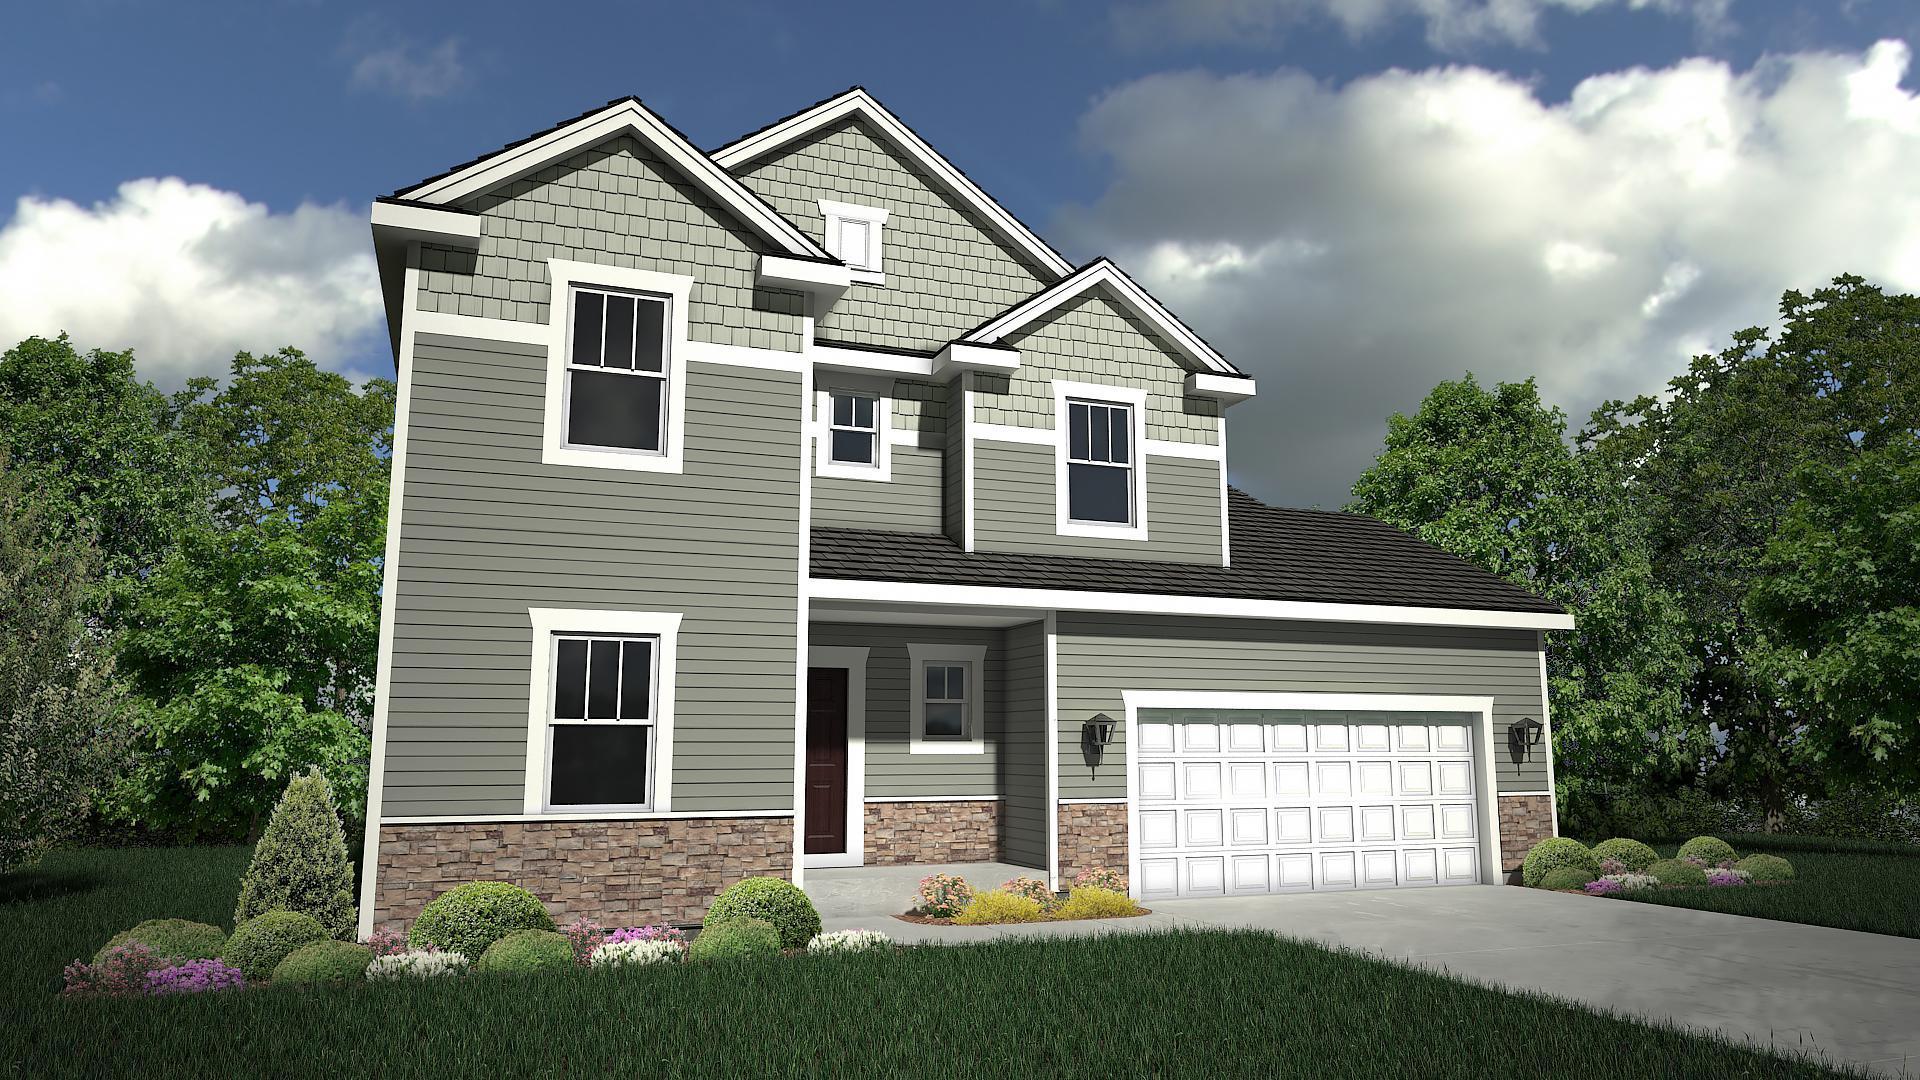 Terrific New Construction Homes Plans In Menomonee Falls Wi 699 Download Free Architecture Designs Sospemadebymaigaardcom